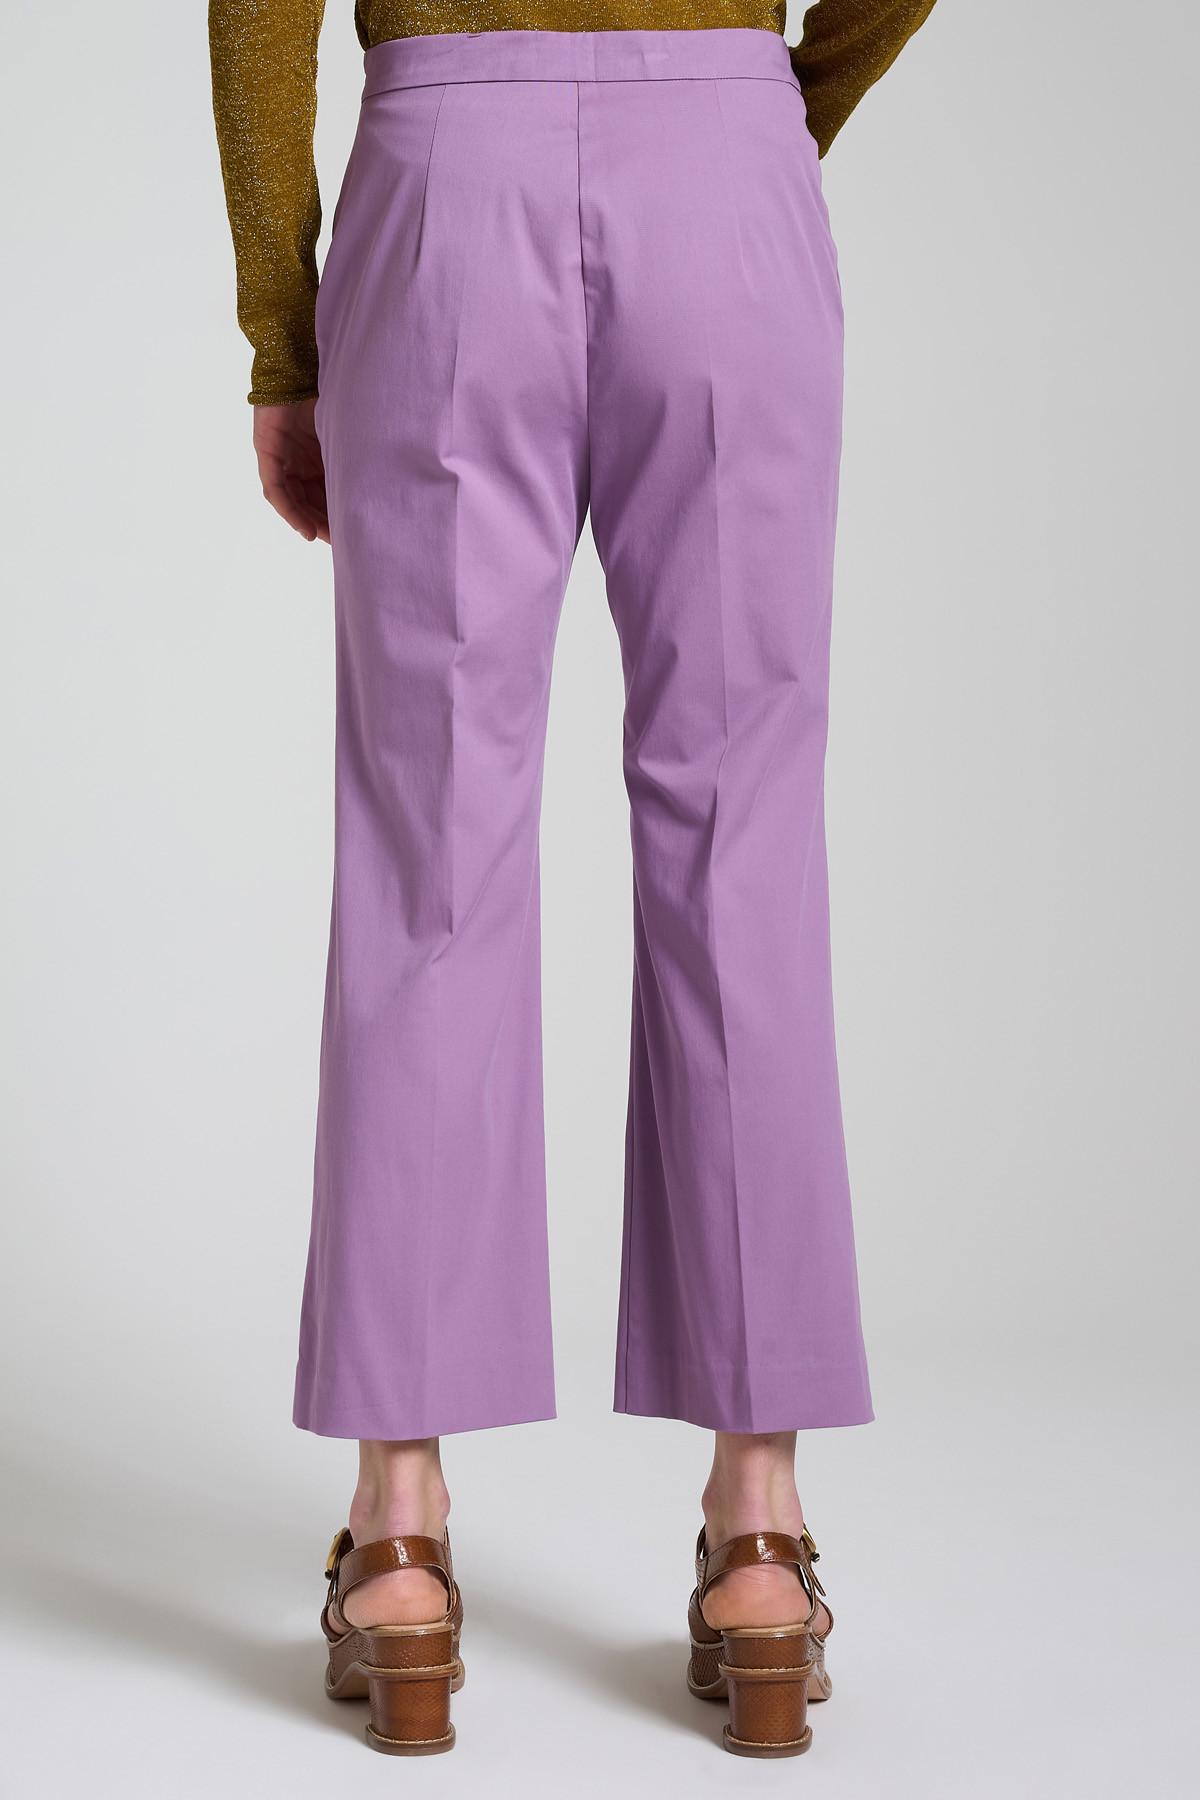 Women's Clothing Stretch Gabardine Wisteria Trousers Maliparmi | Skirts and Pants | JH71441013651036